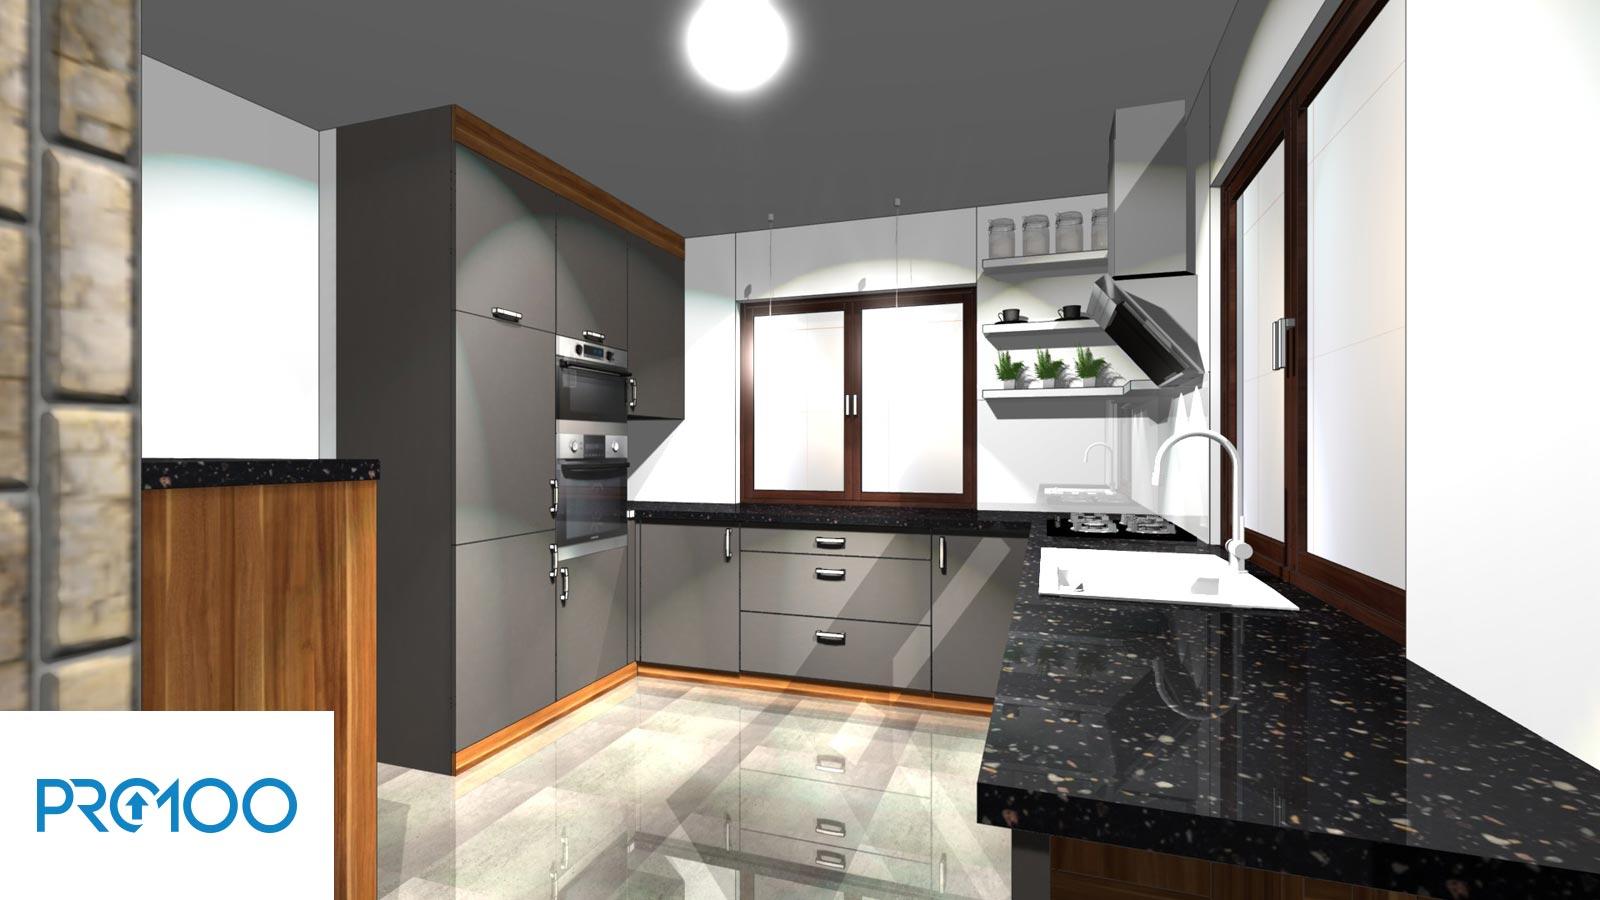 Kuchnie Komputerowe Projekty 3d Adams żary Meble